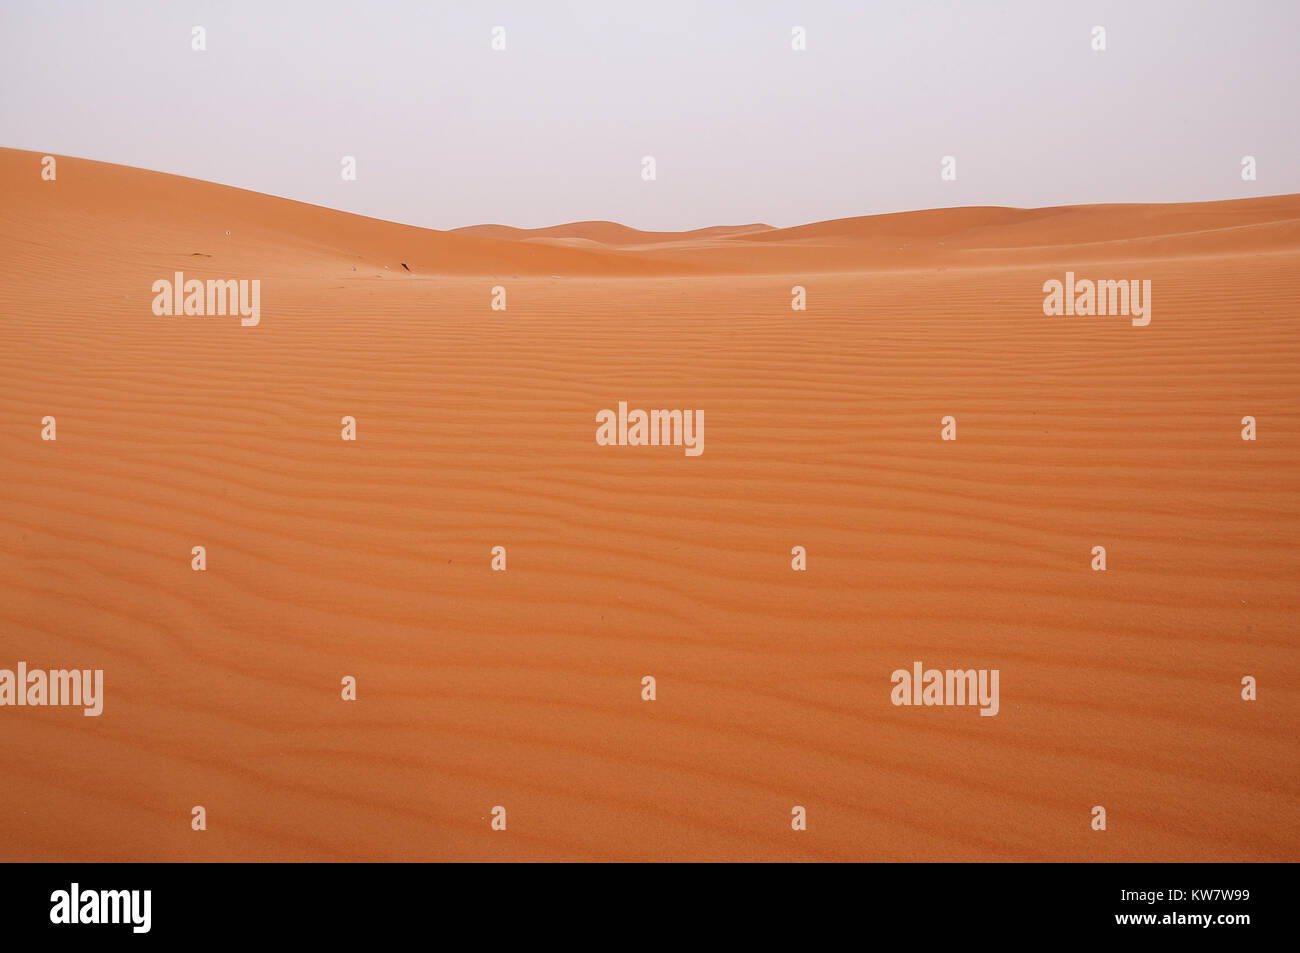 The view of Riyadh desert - Stock Image